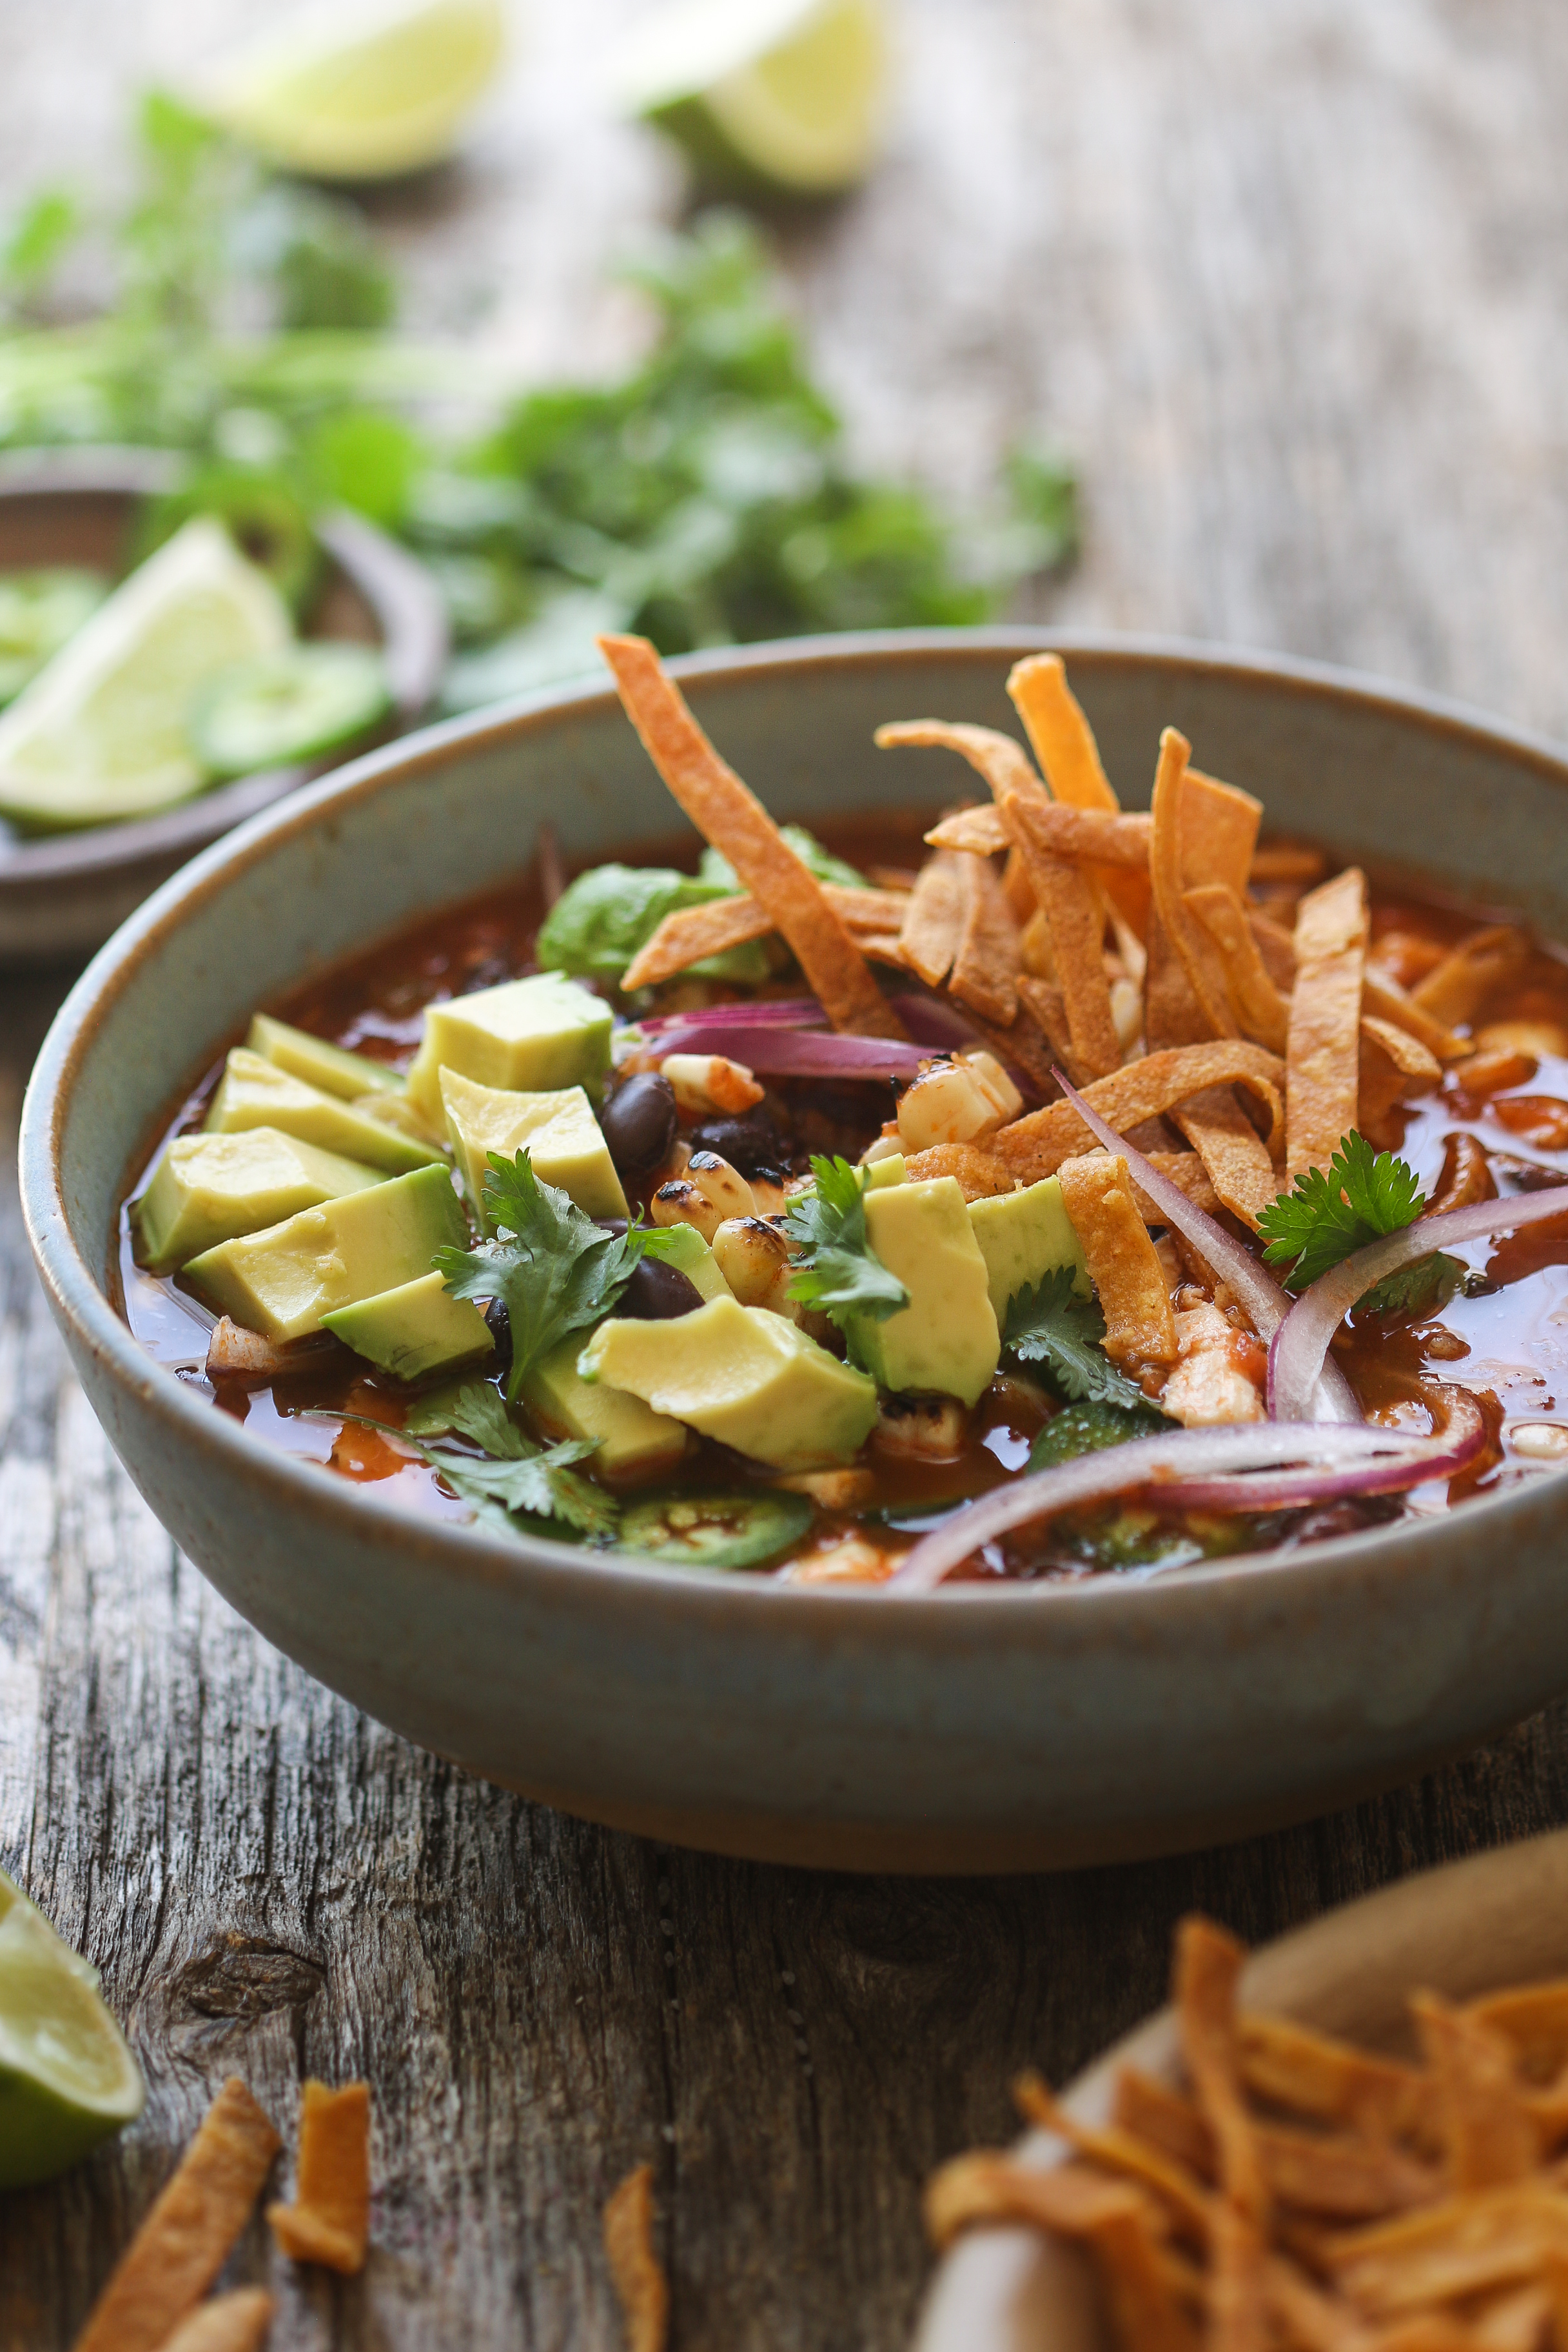 Shortcut Mexican Chicken Tortilla Soup - Delicious and Easy